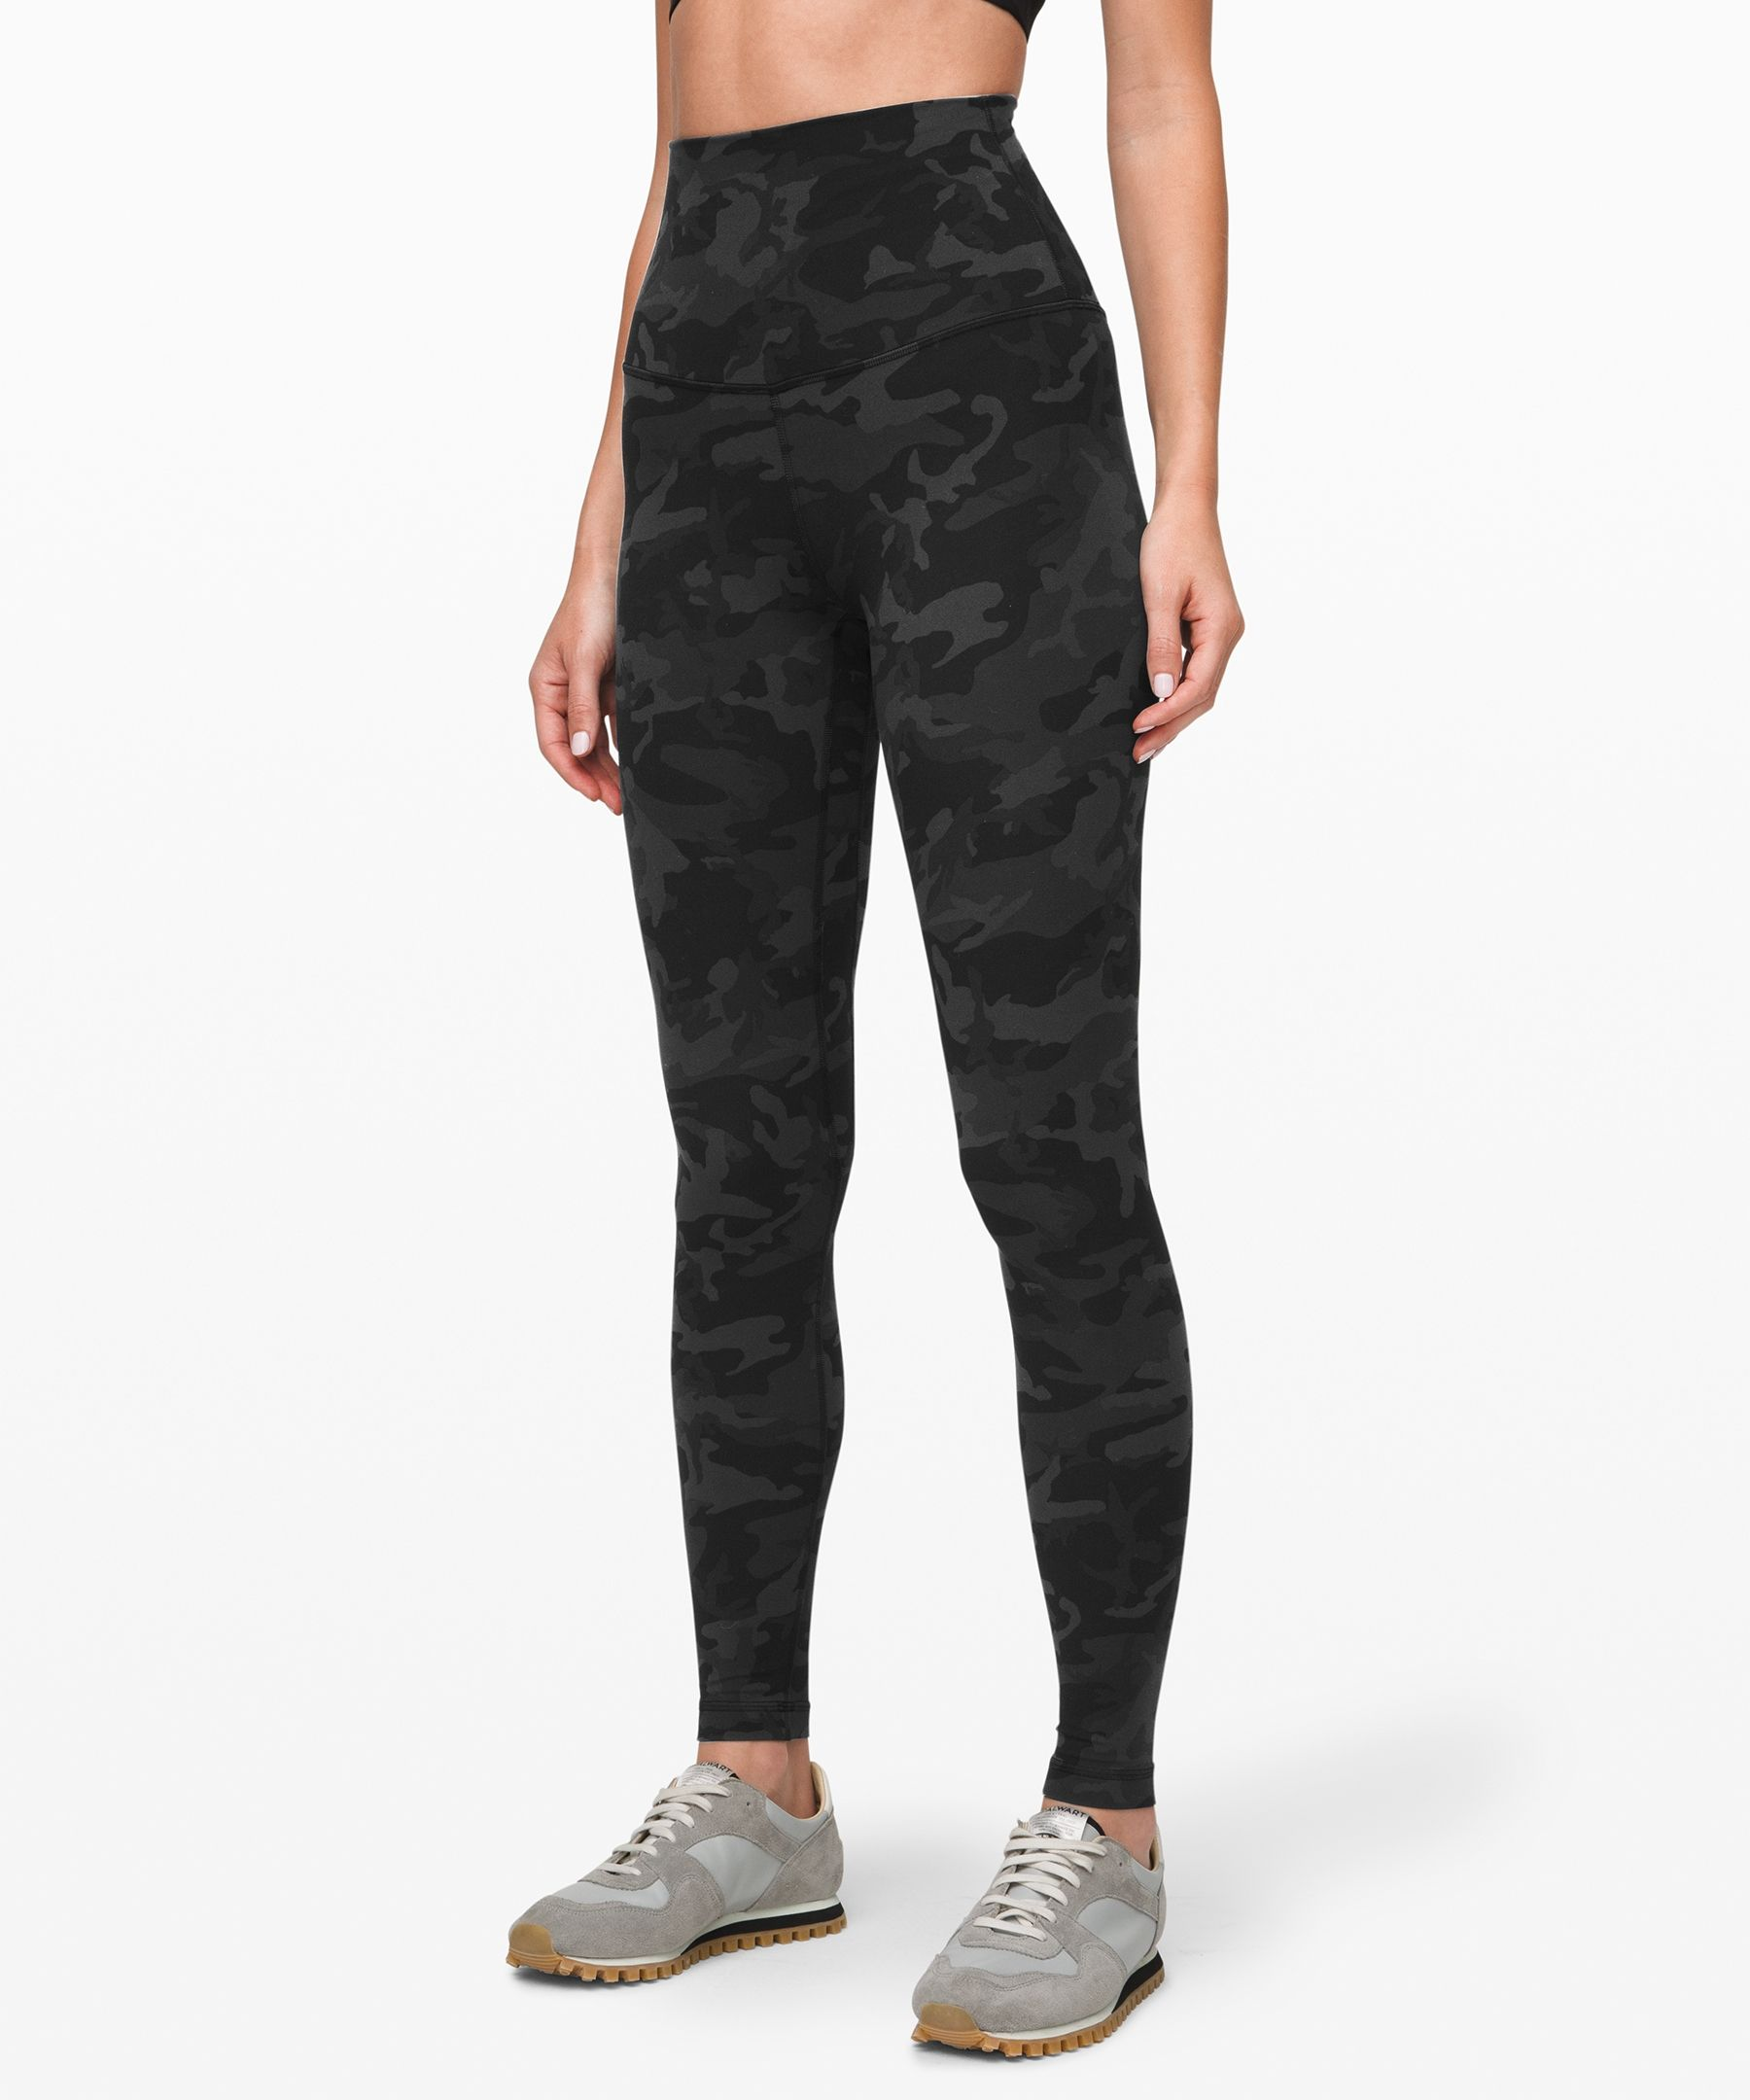 Align Super High Rise Pant 28 Women S Pants Pants For Women High Rise Pants Workout Gear For Women